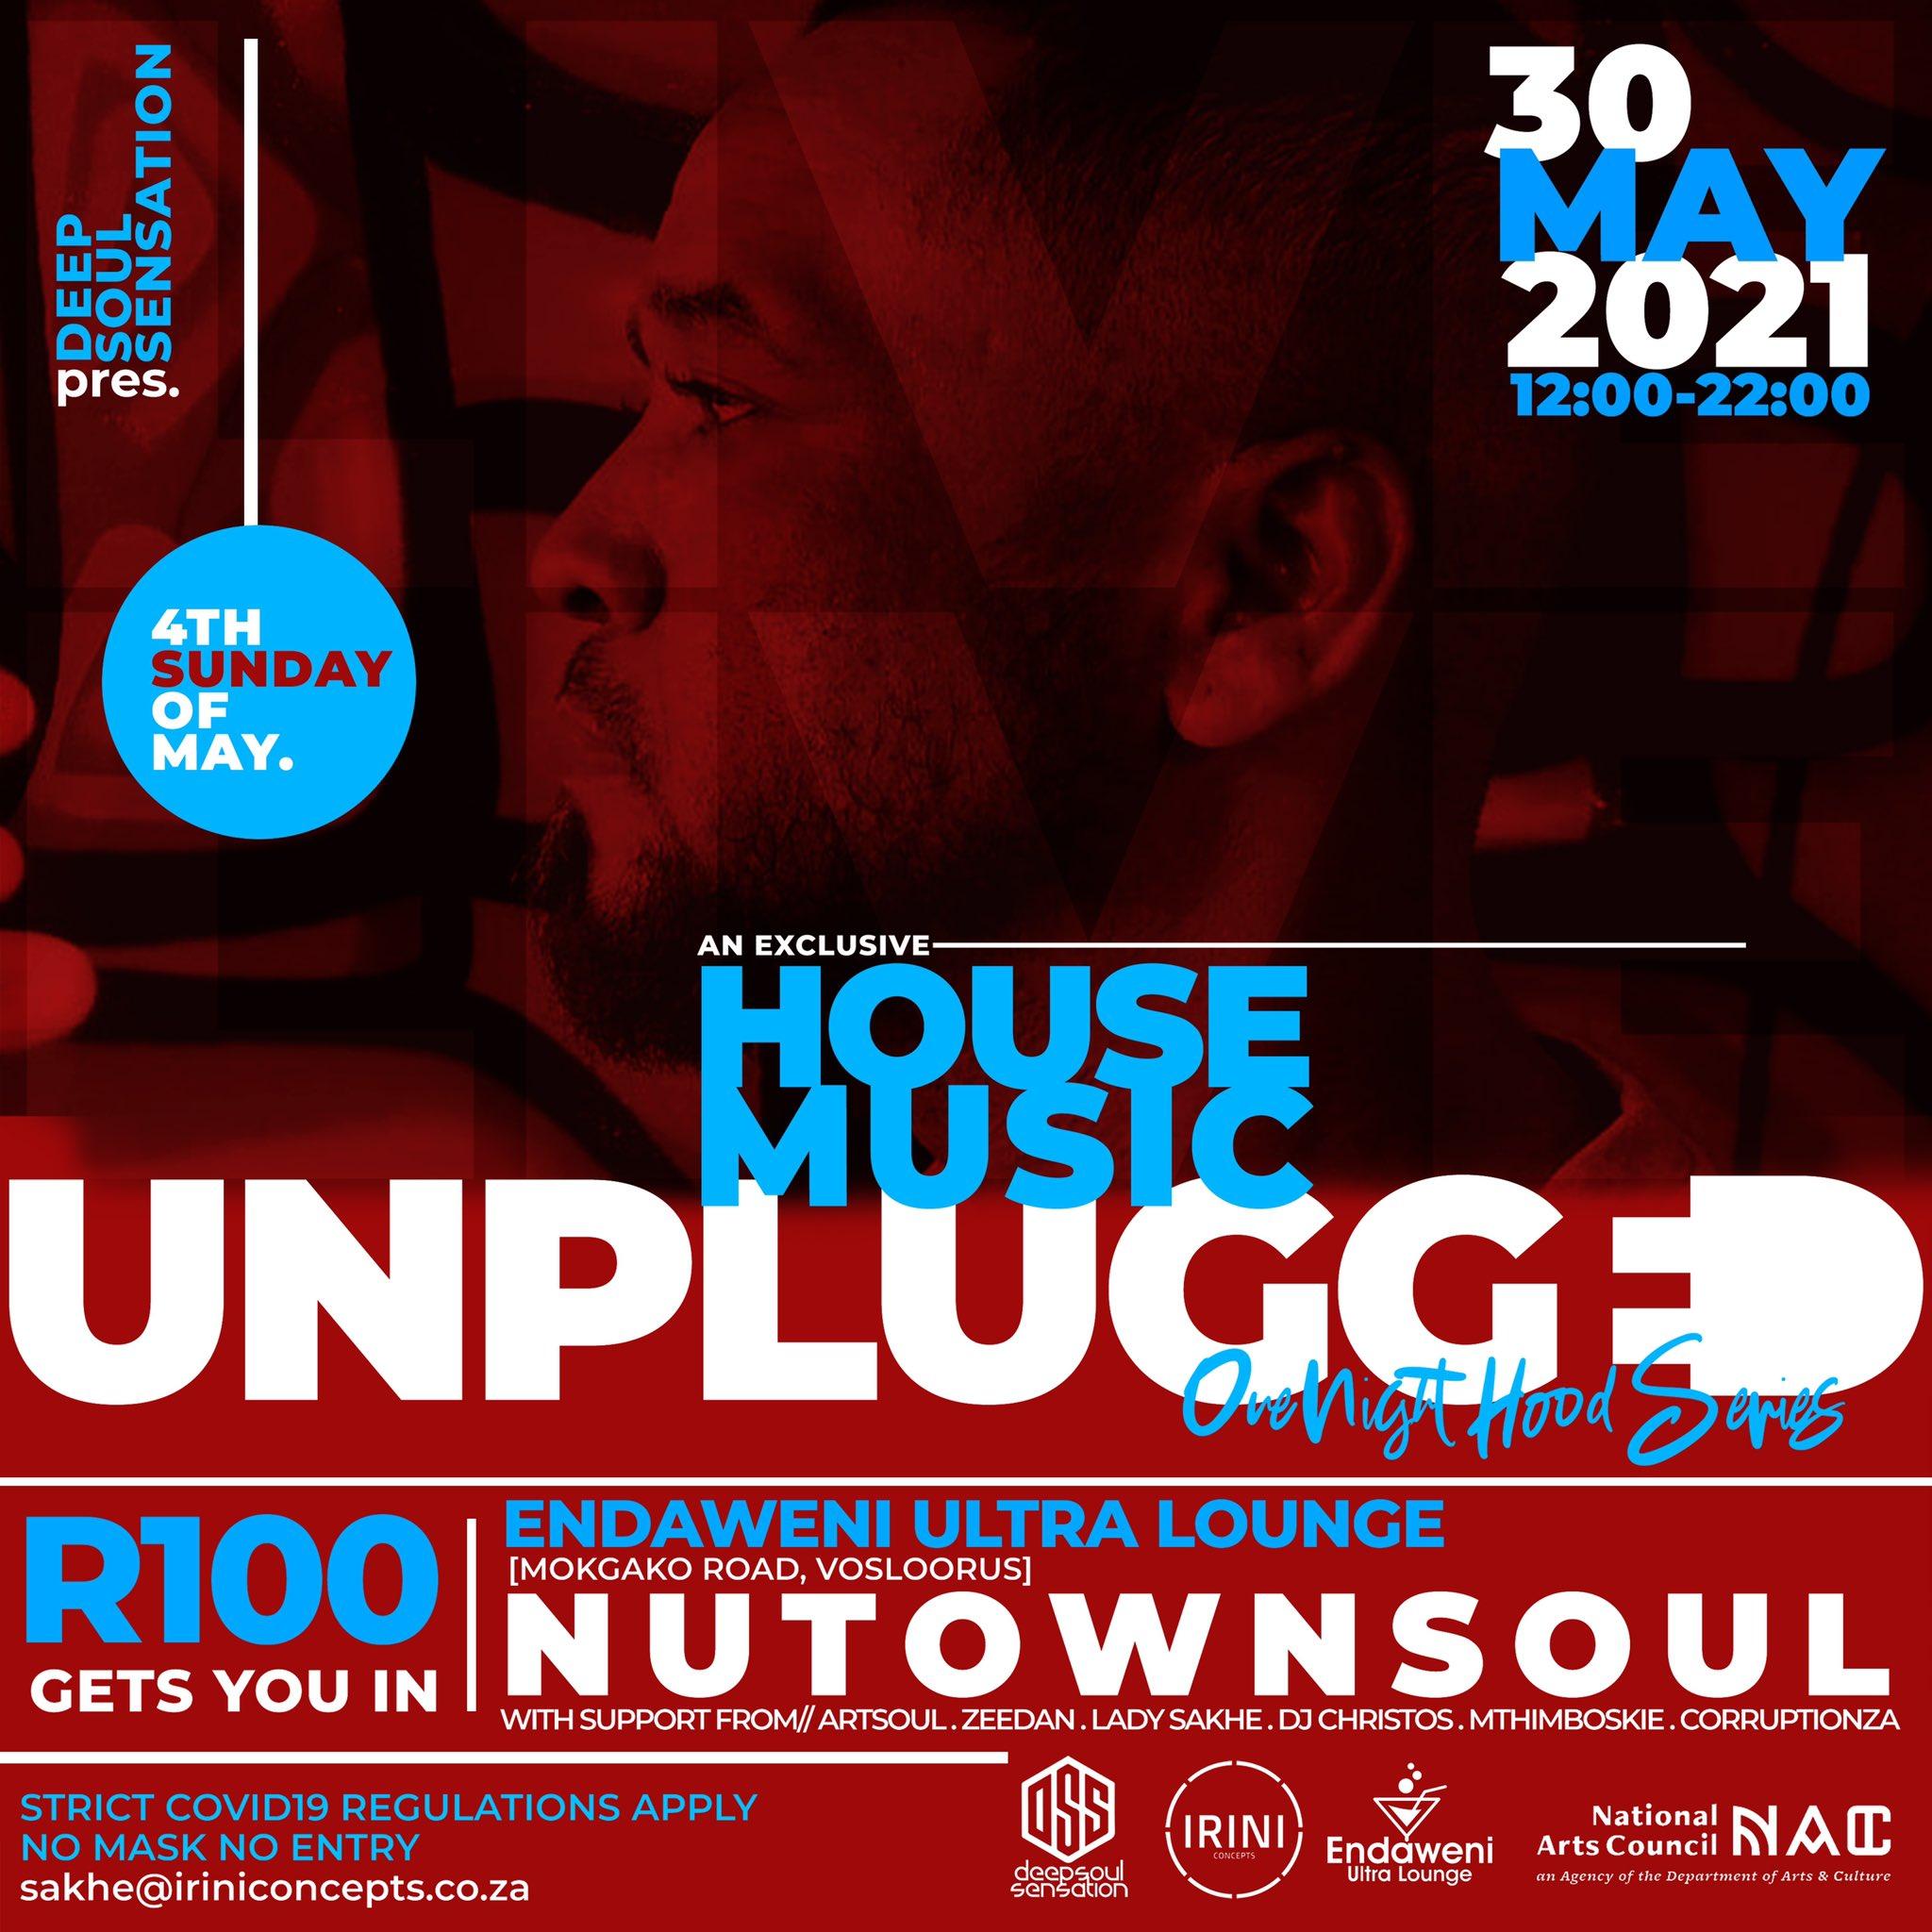 House Music Unplugged